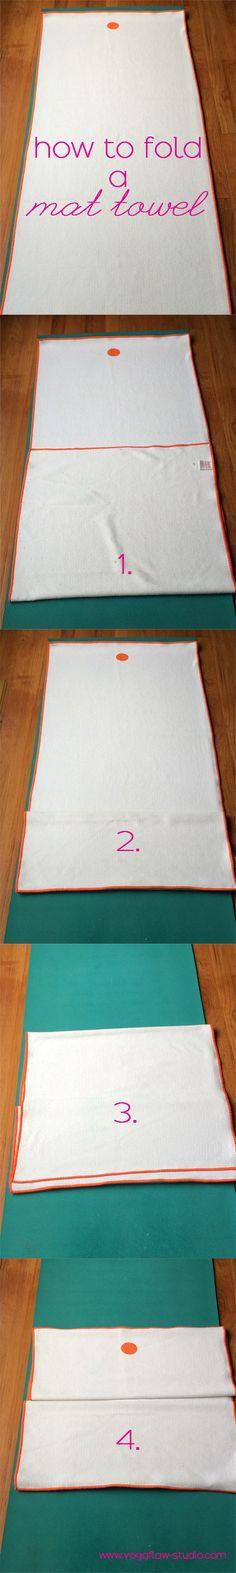 How to fold your yoga mat towel | www.yogaflow-studio.com